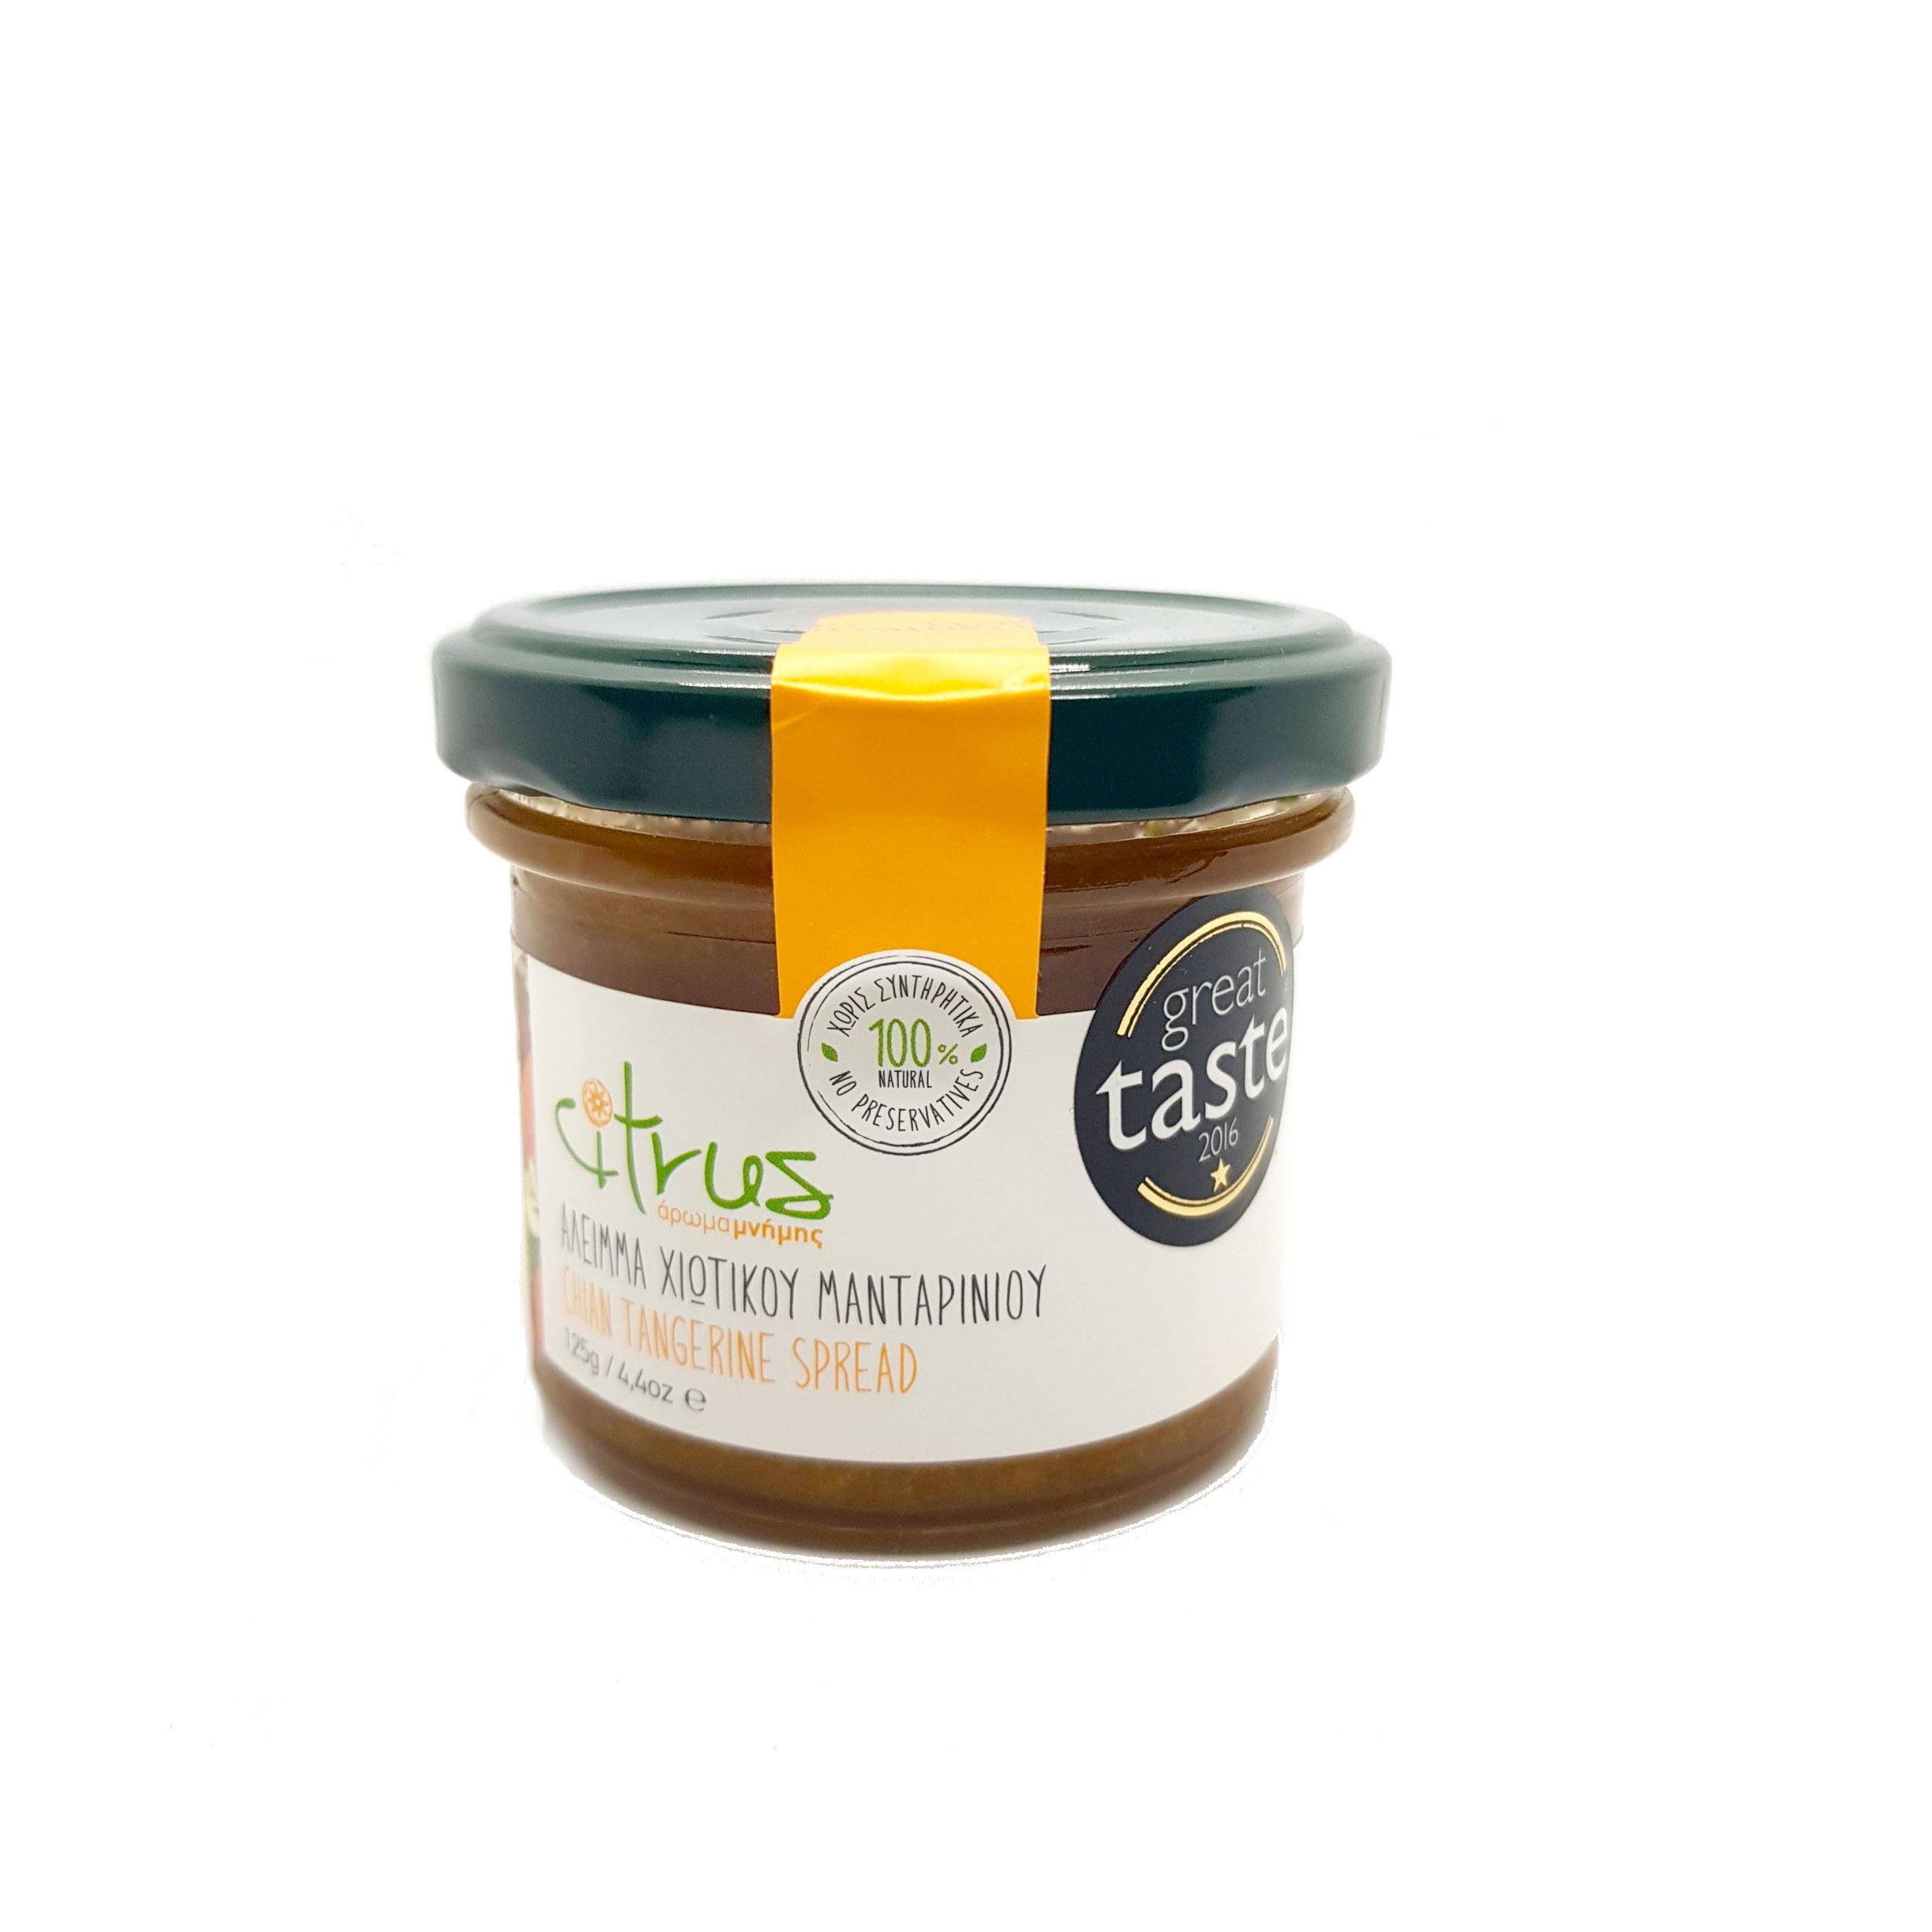 marmellata naturale di mandarino Chios D.O.P.